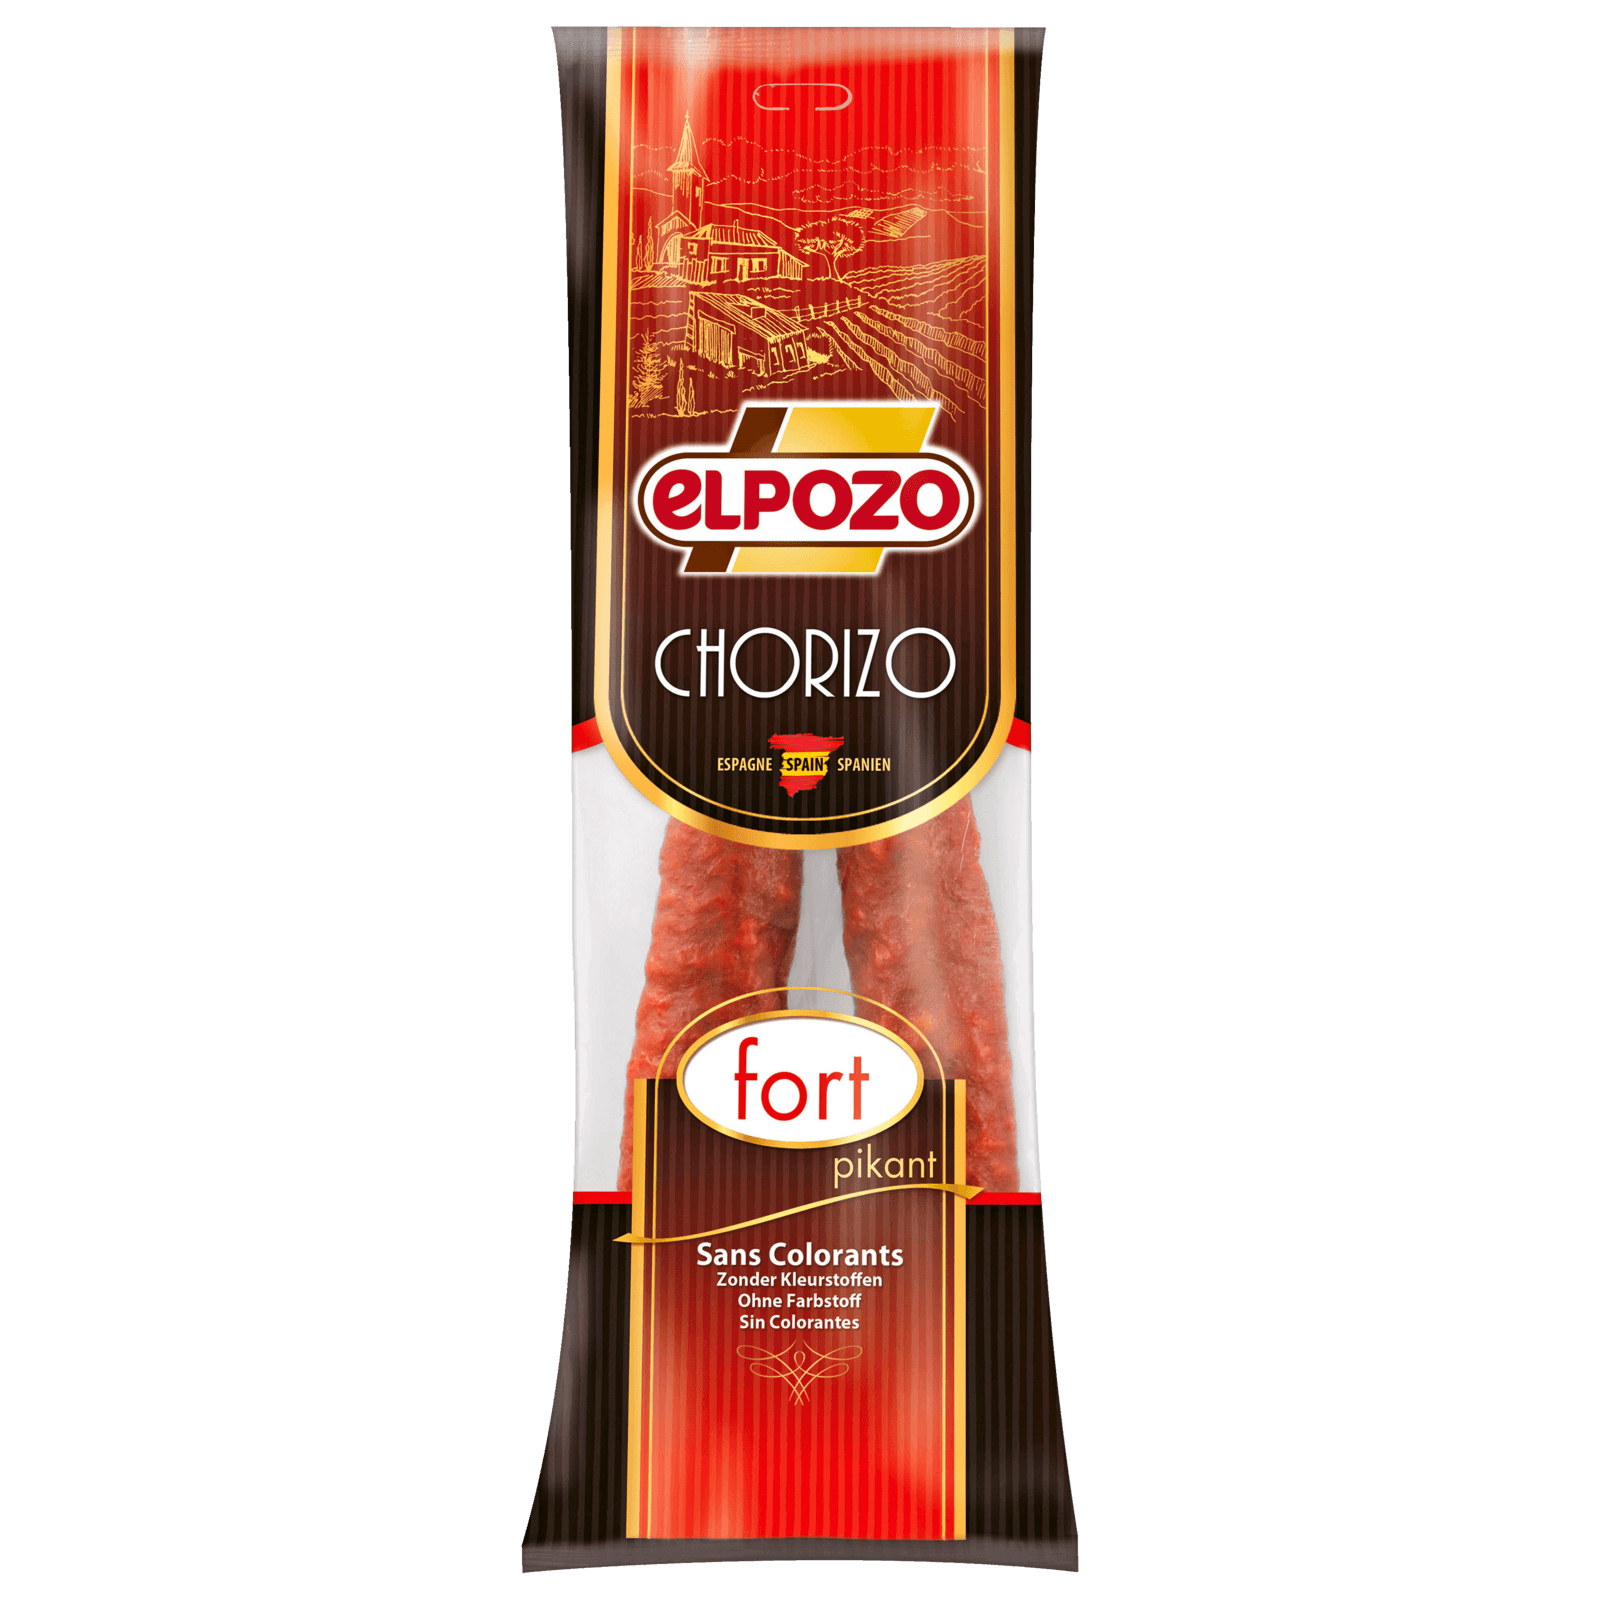 Elpozo Chorizo Sarta Picante 225g